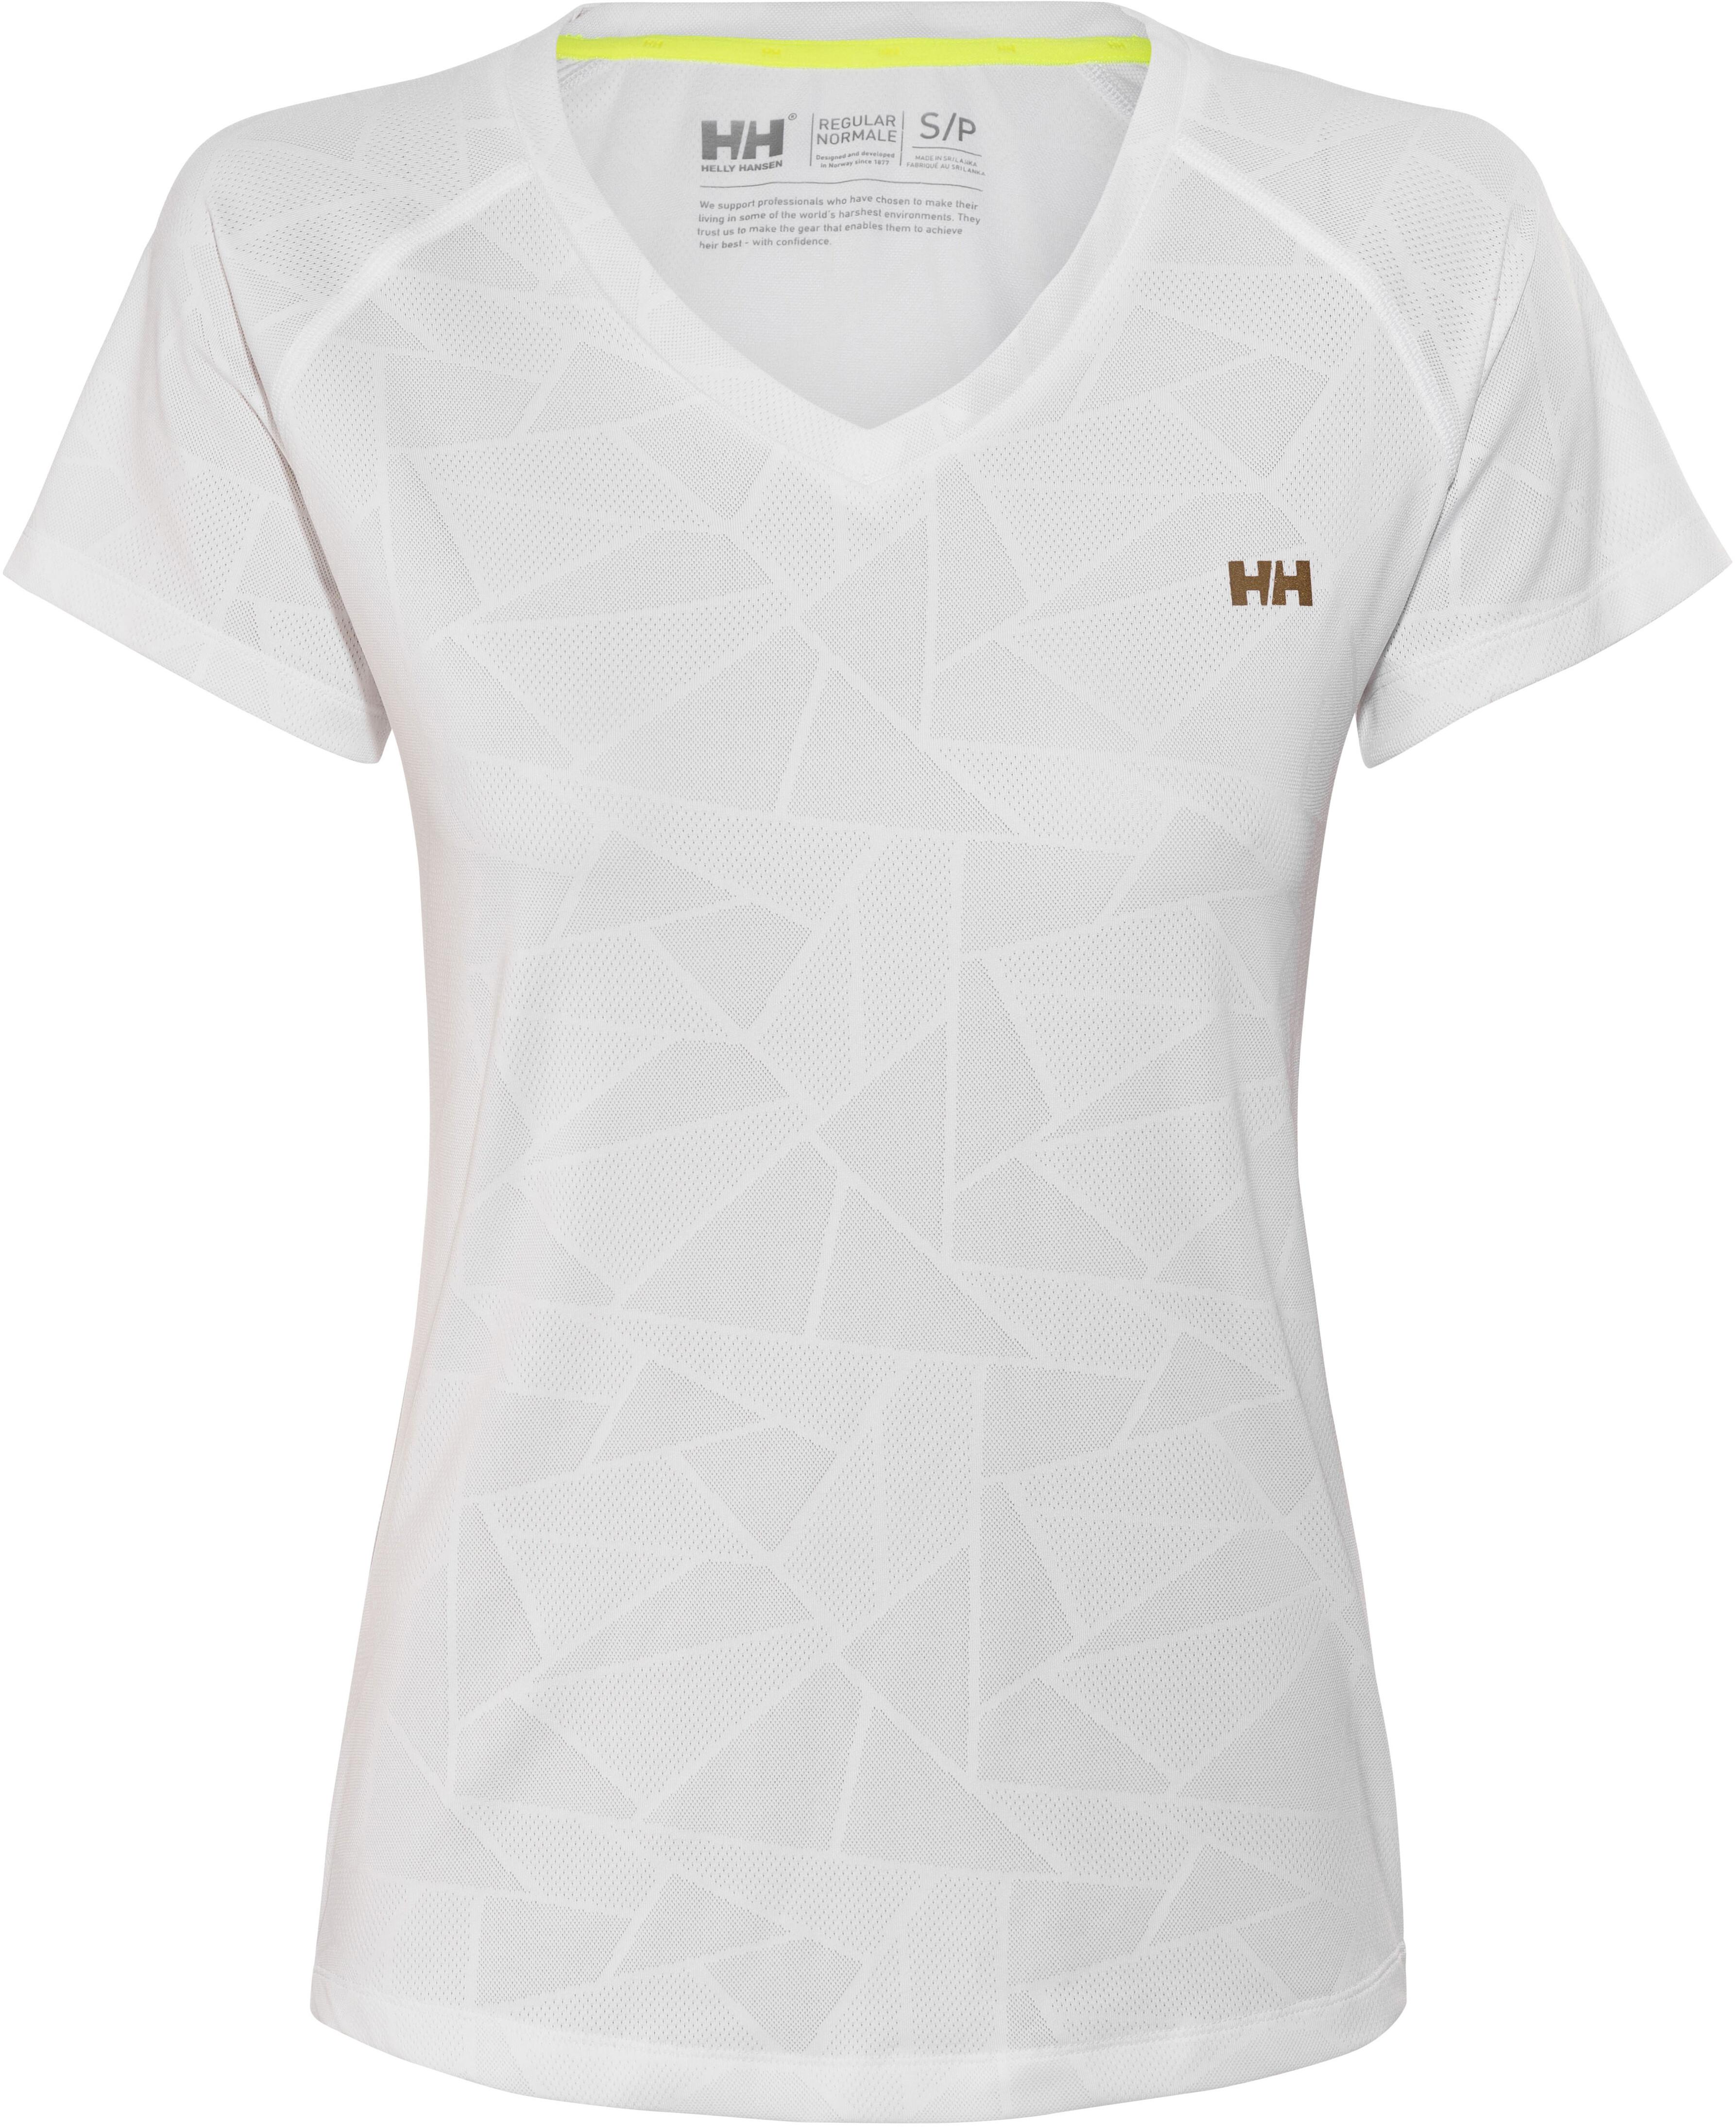 845353f298e Helly Hansen Selsli t-shirt Dames wit